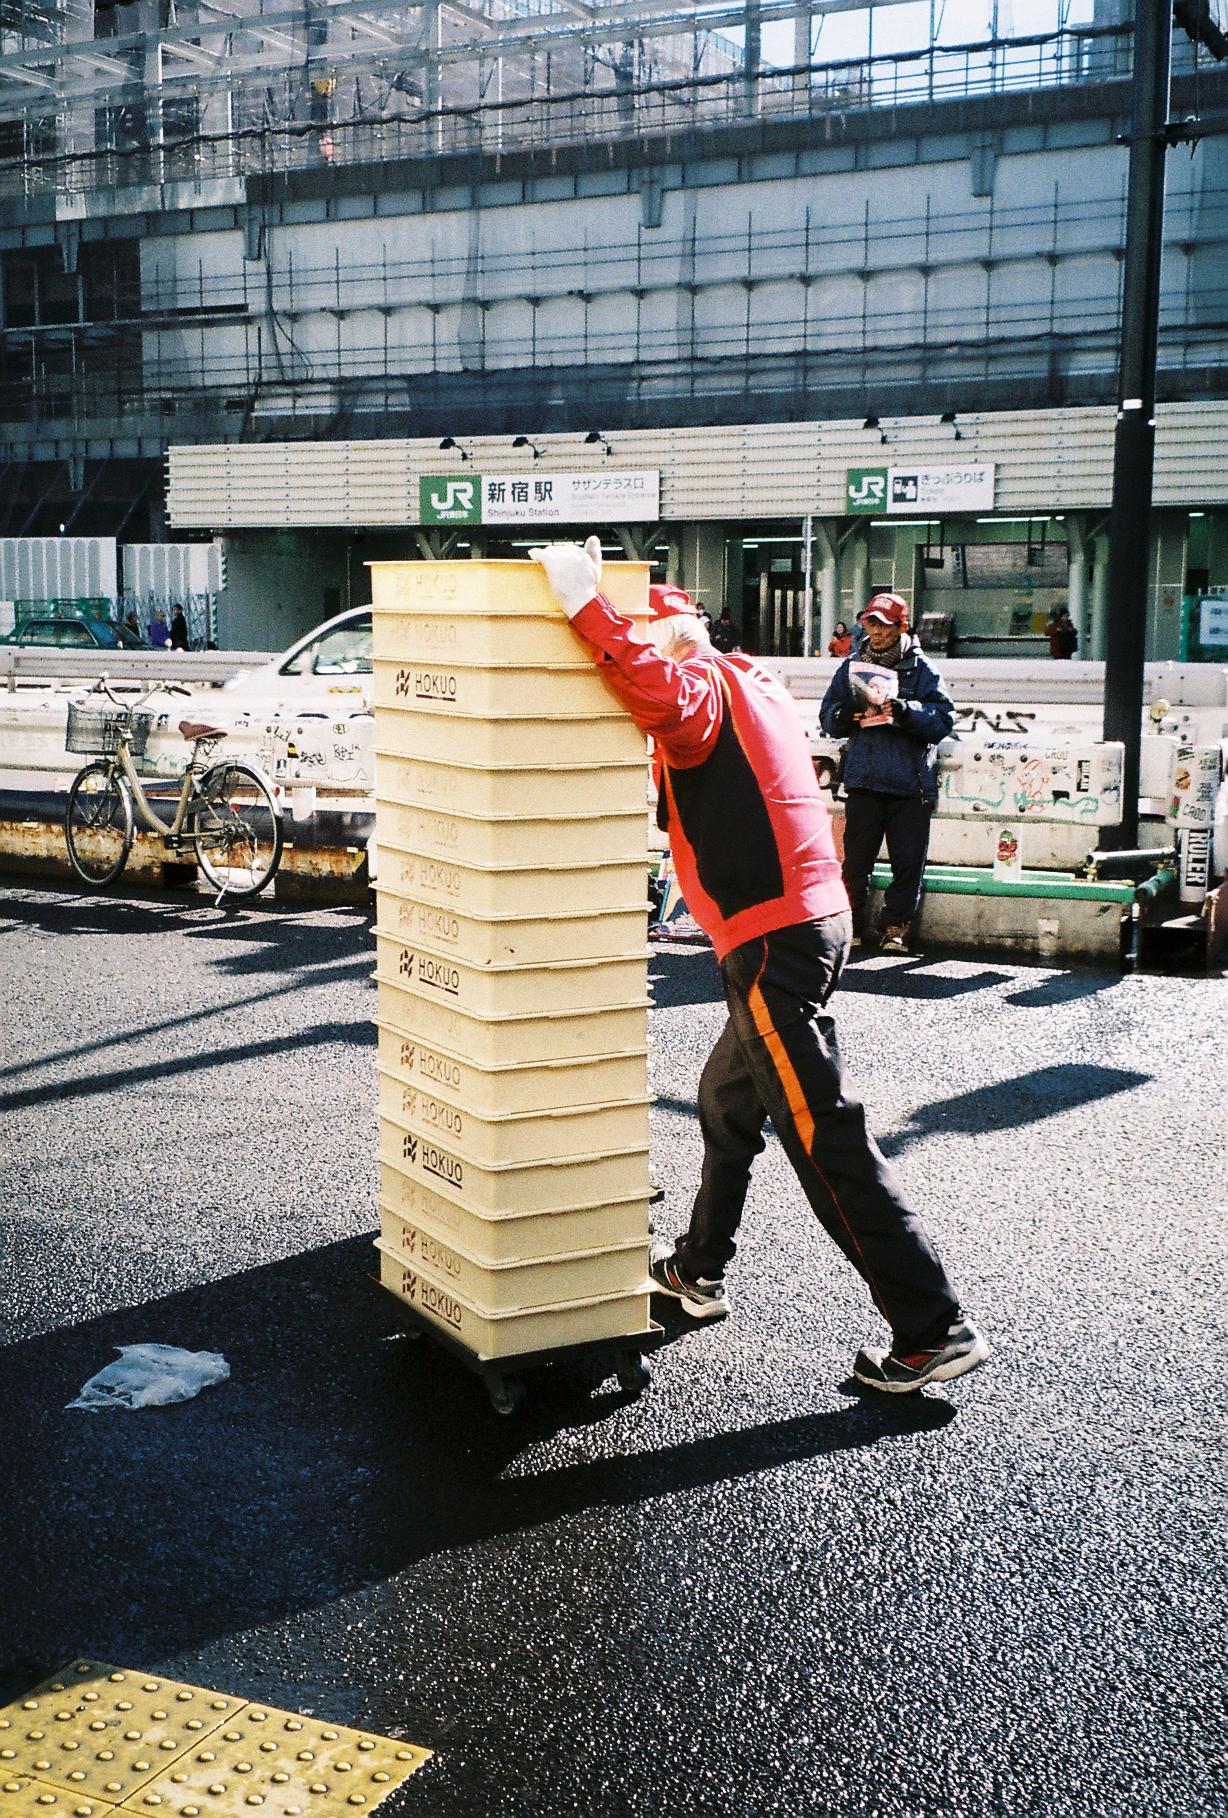 Tokyo, Japan. 35mm film